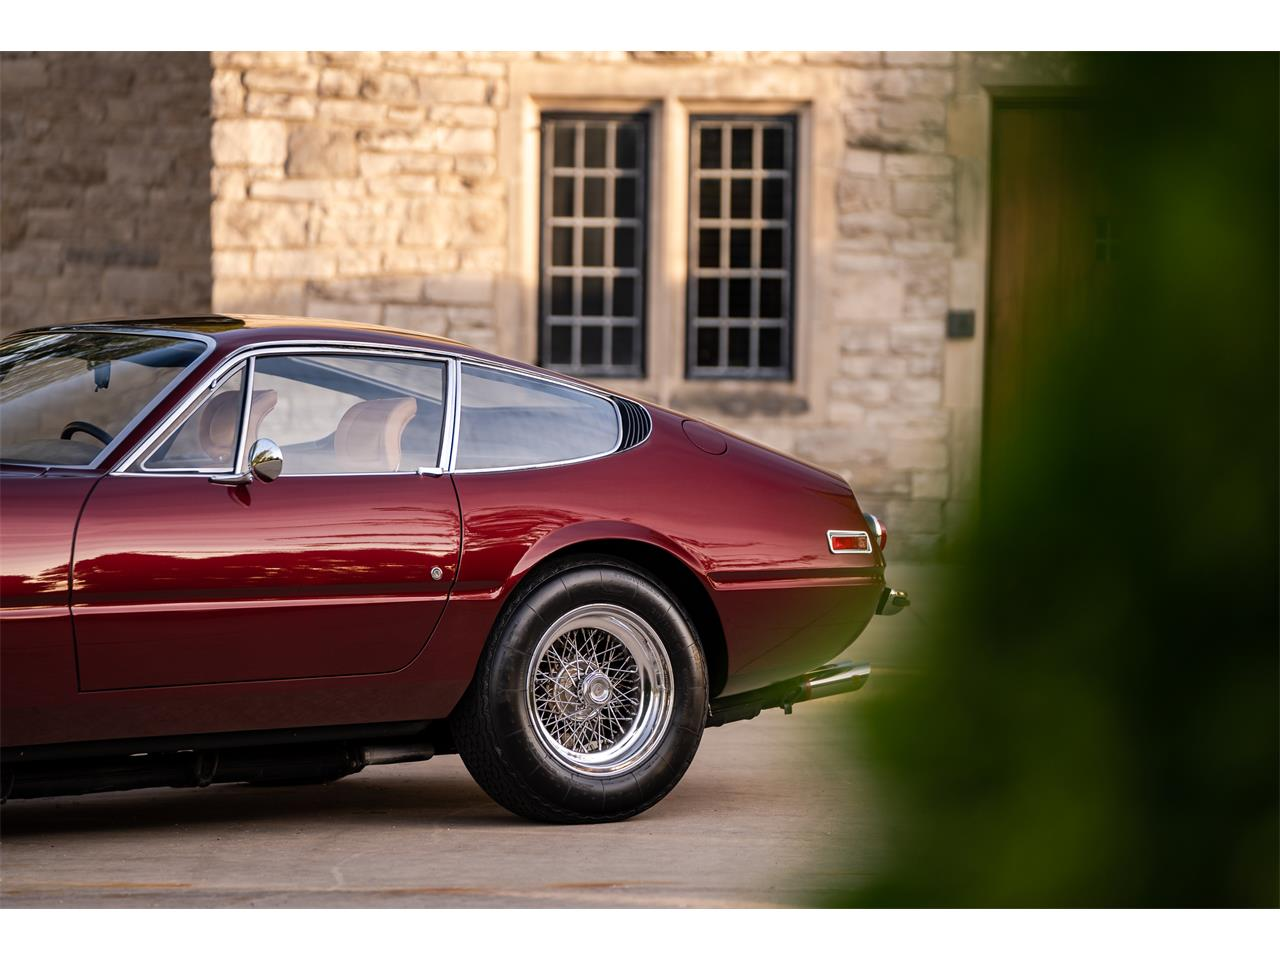 Large Picture of Classic '72 Ferrari 365 GTB/4 Daytona - $725,000.00 - QL32